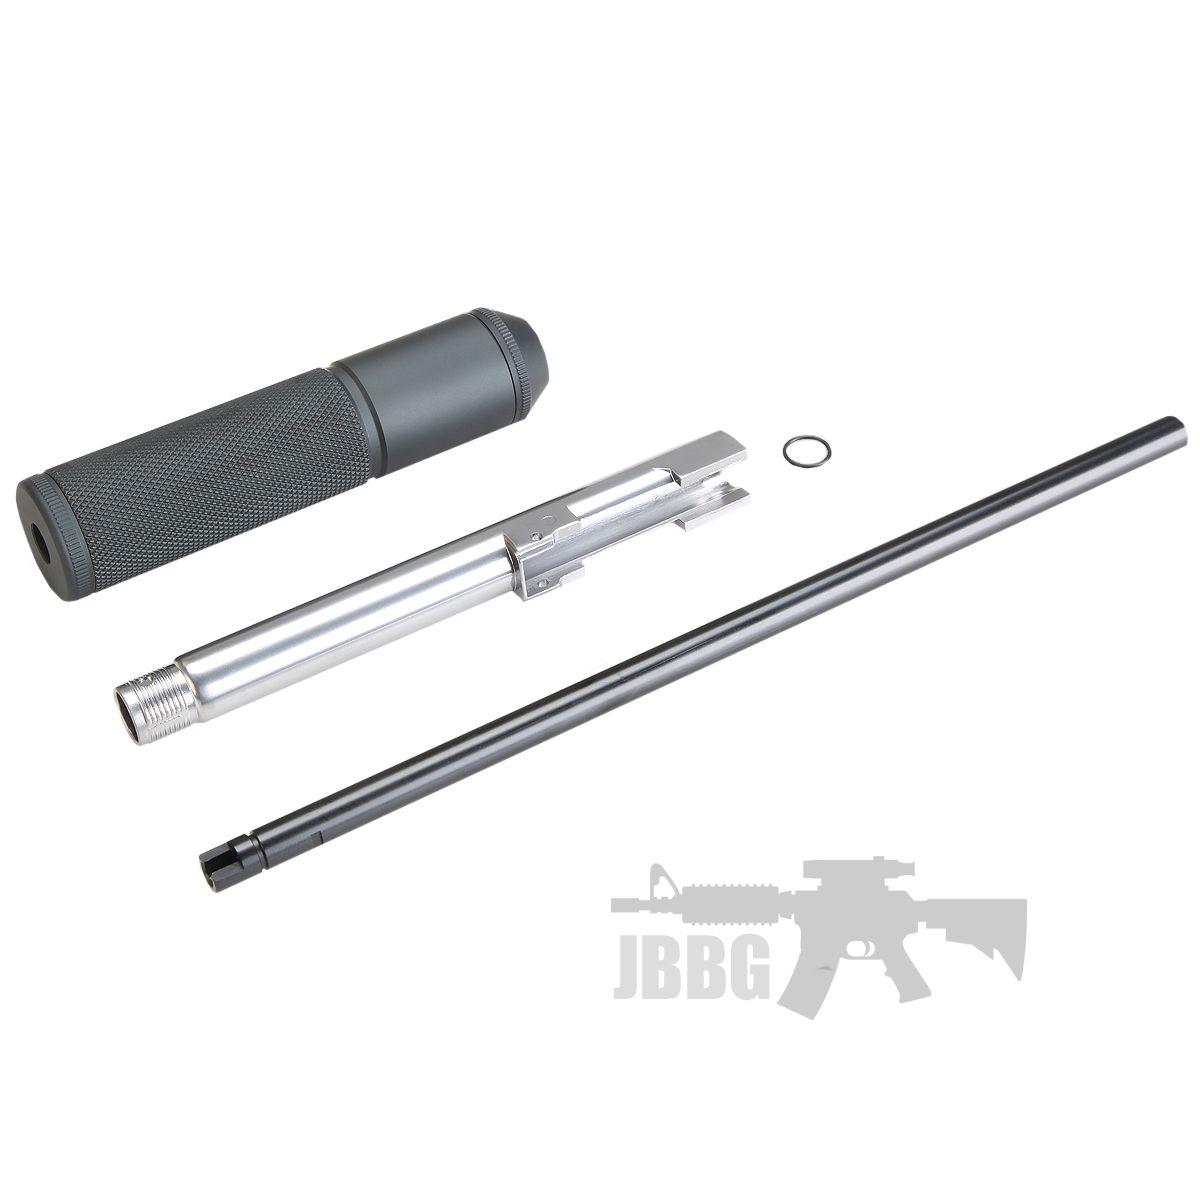 KLI Silver Extended Barrel Plus Inner Barrel and Silencer